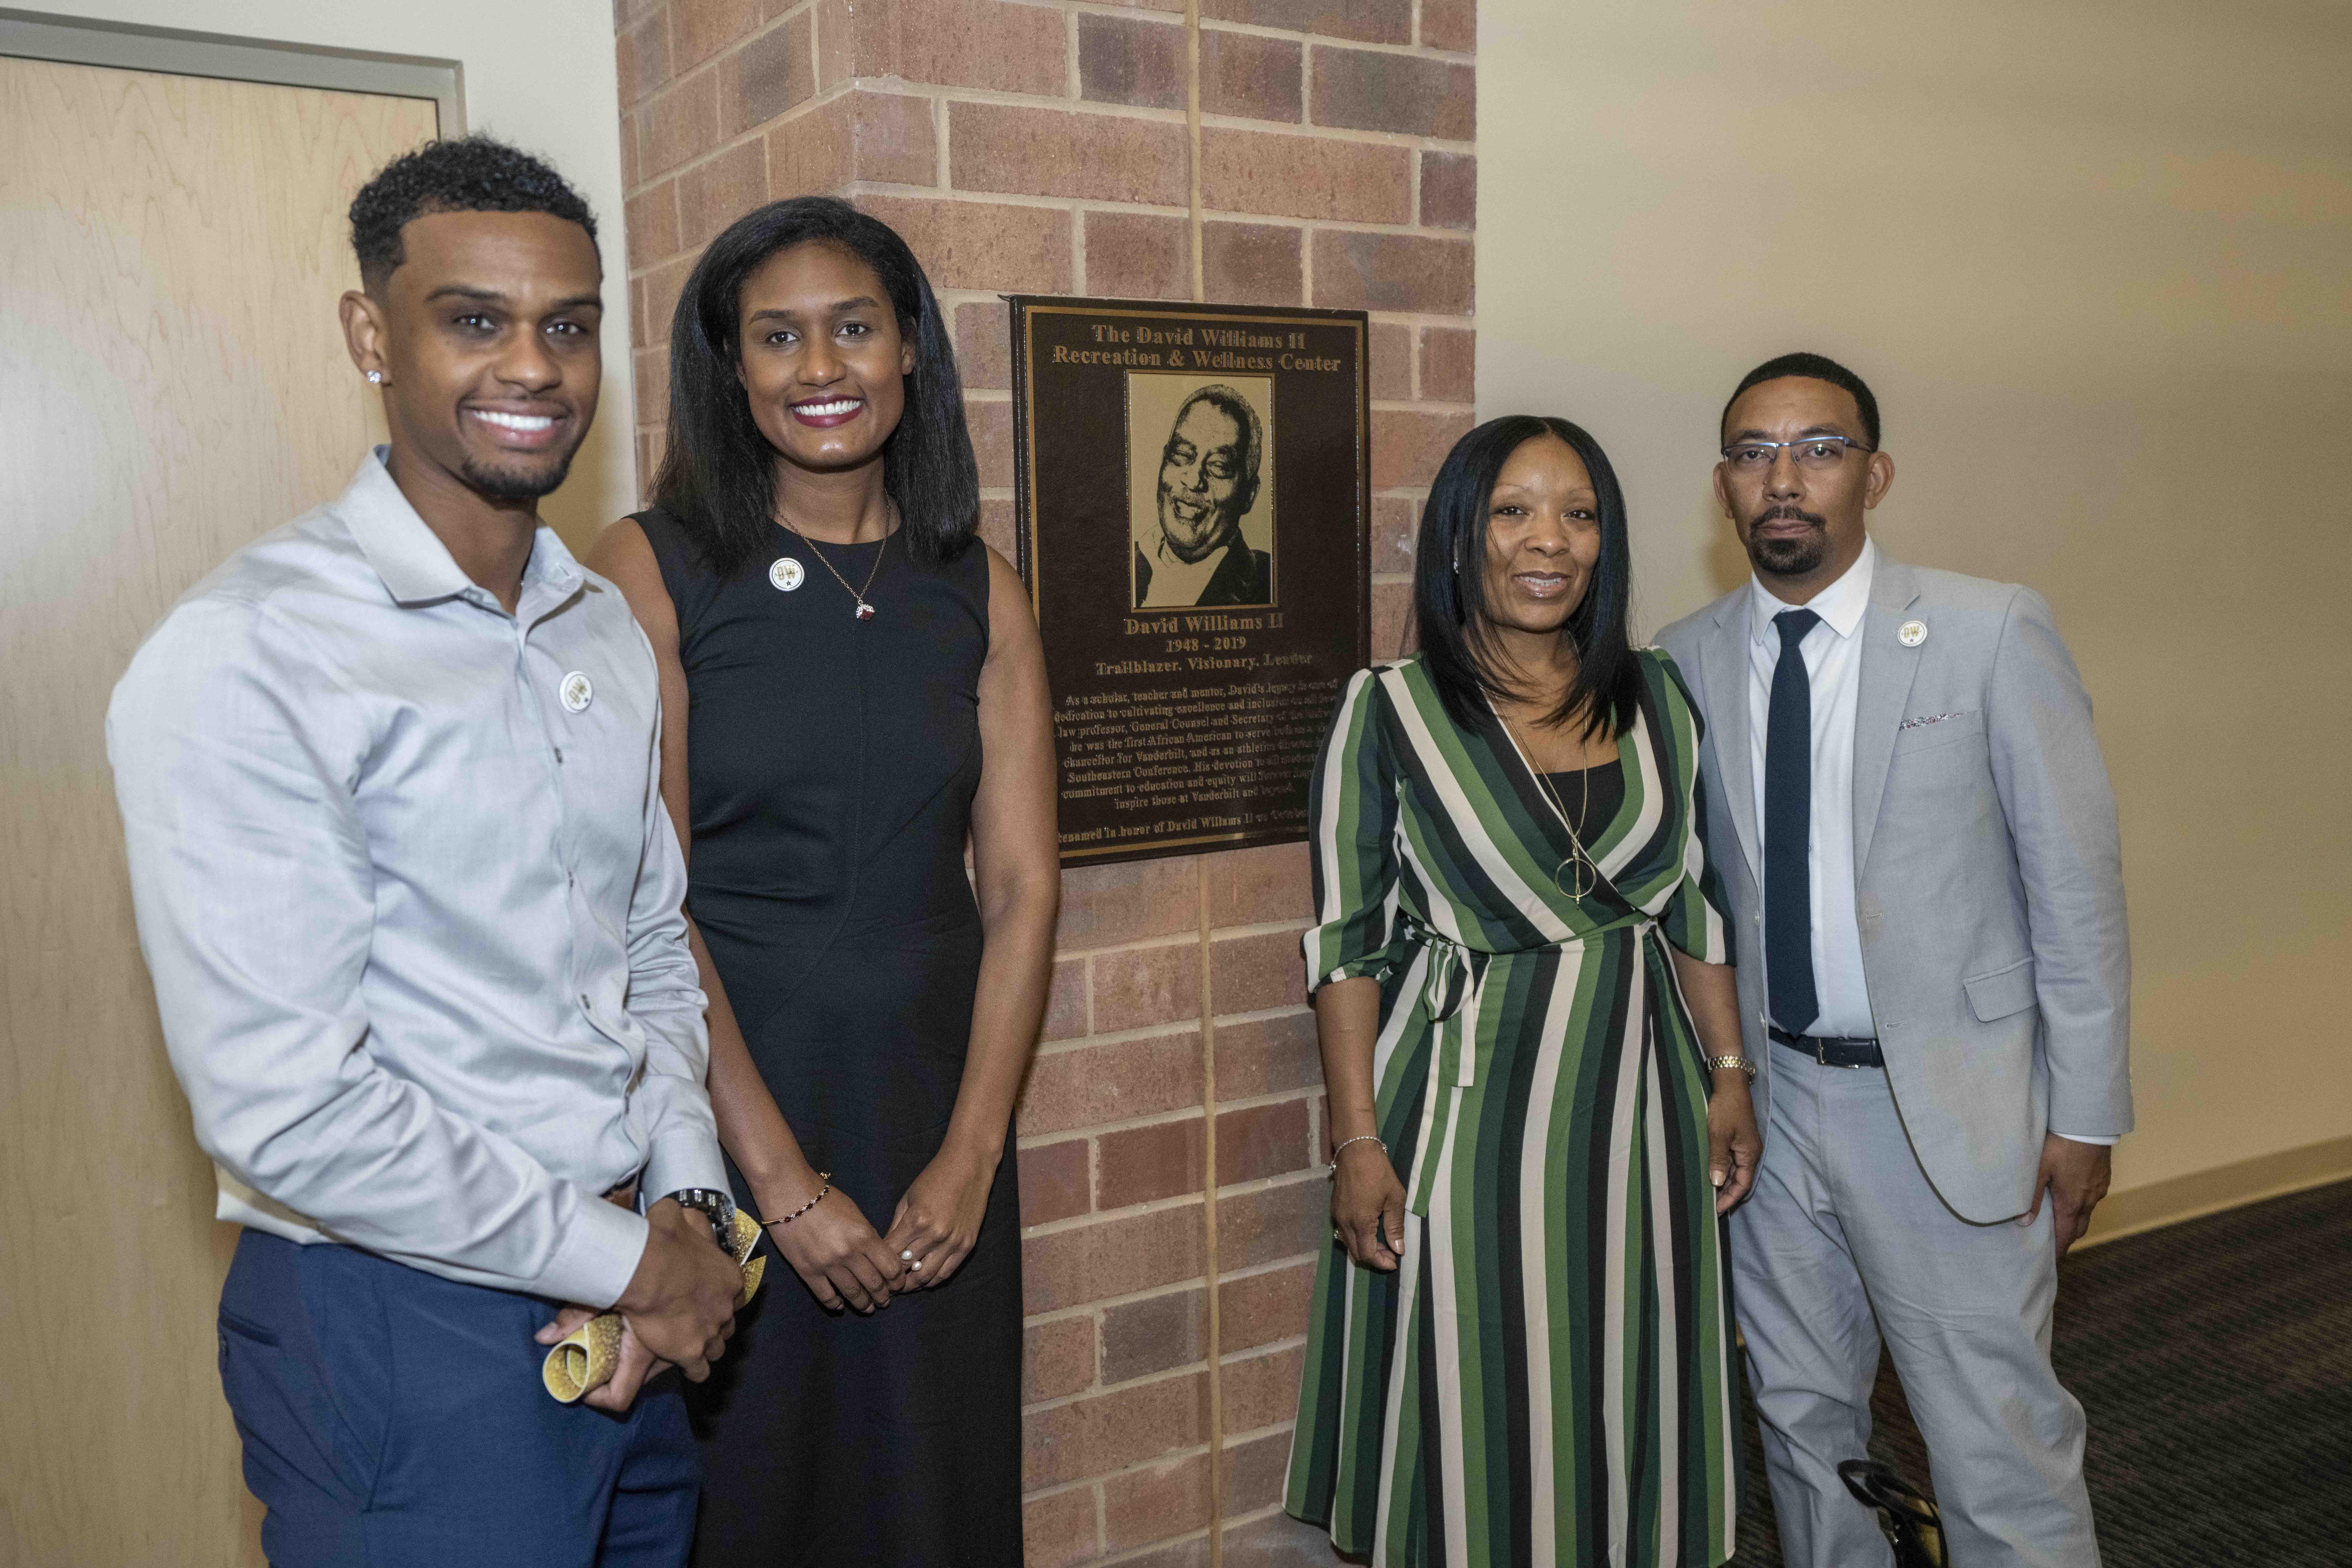 David Williams' children stand next to a new plaque honoring Vanderbilt's late former athletics director and vice chancellor. (John Russell/Vanderbilt University)